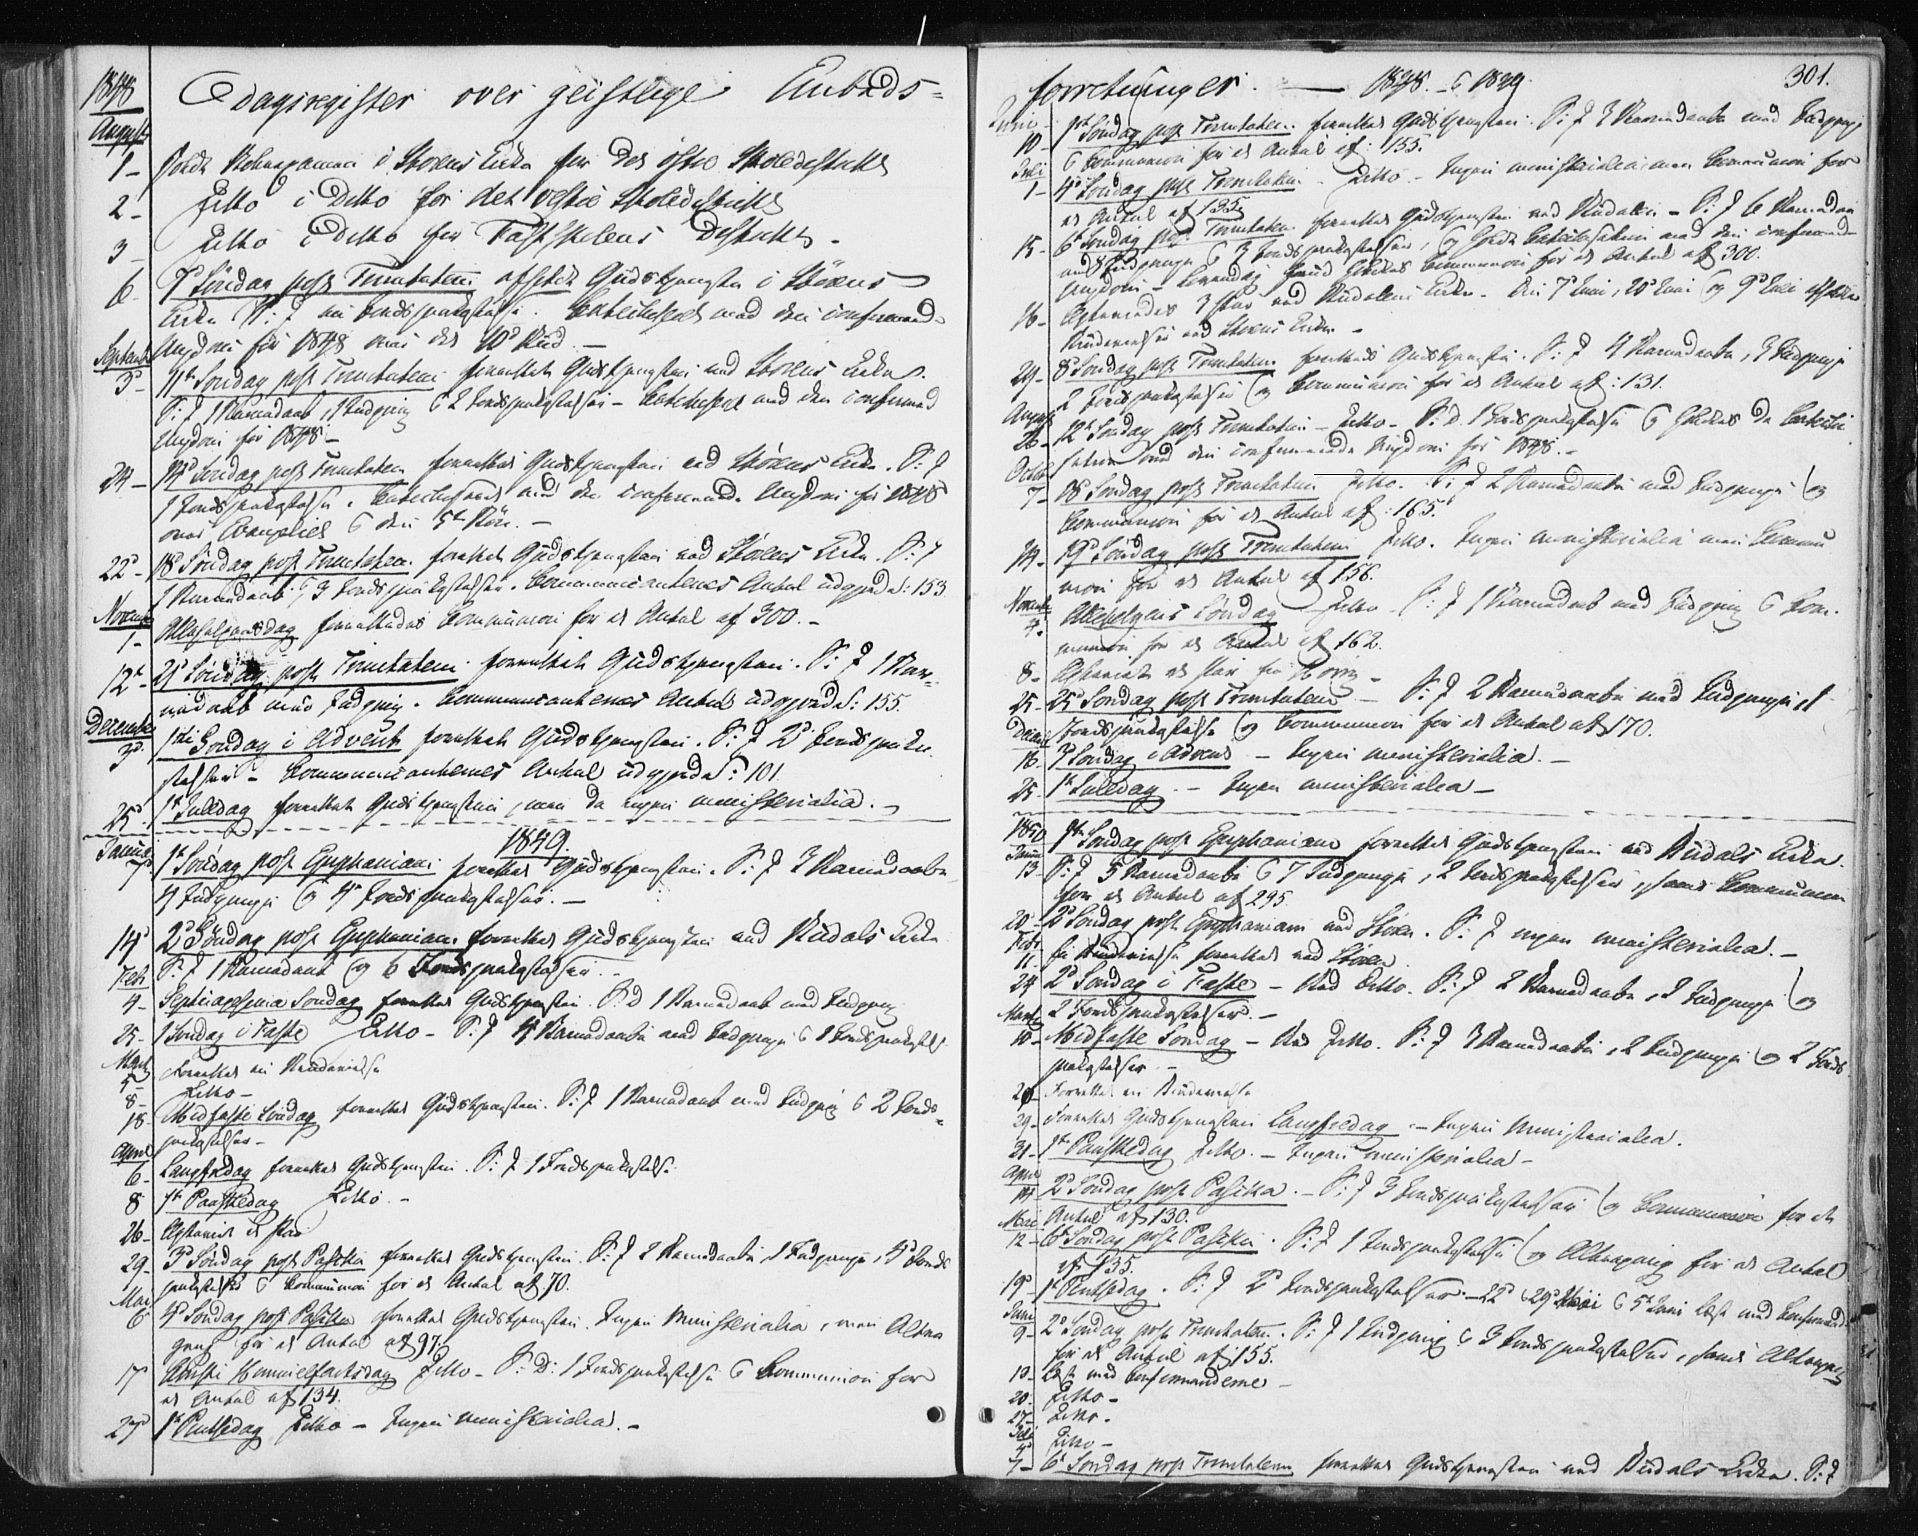 SAT, Ministerialprotokoller, klokkerbøker og fødselsregistre - Sør-Trøndelag, 687/L1000: Parish register (official) no. 687A06, 1848-1869, p. 301